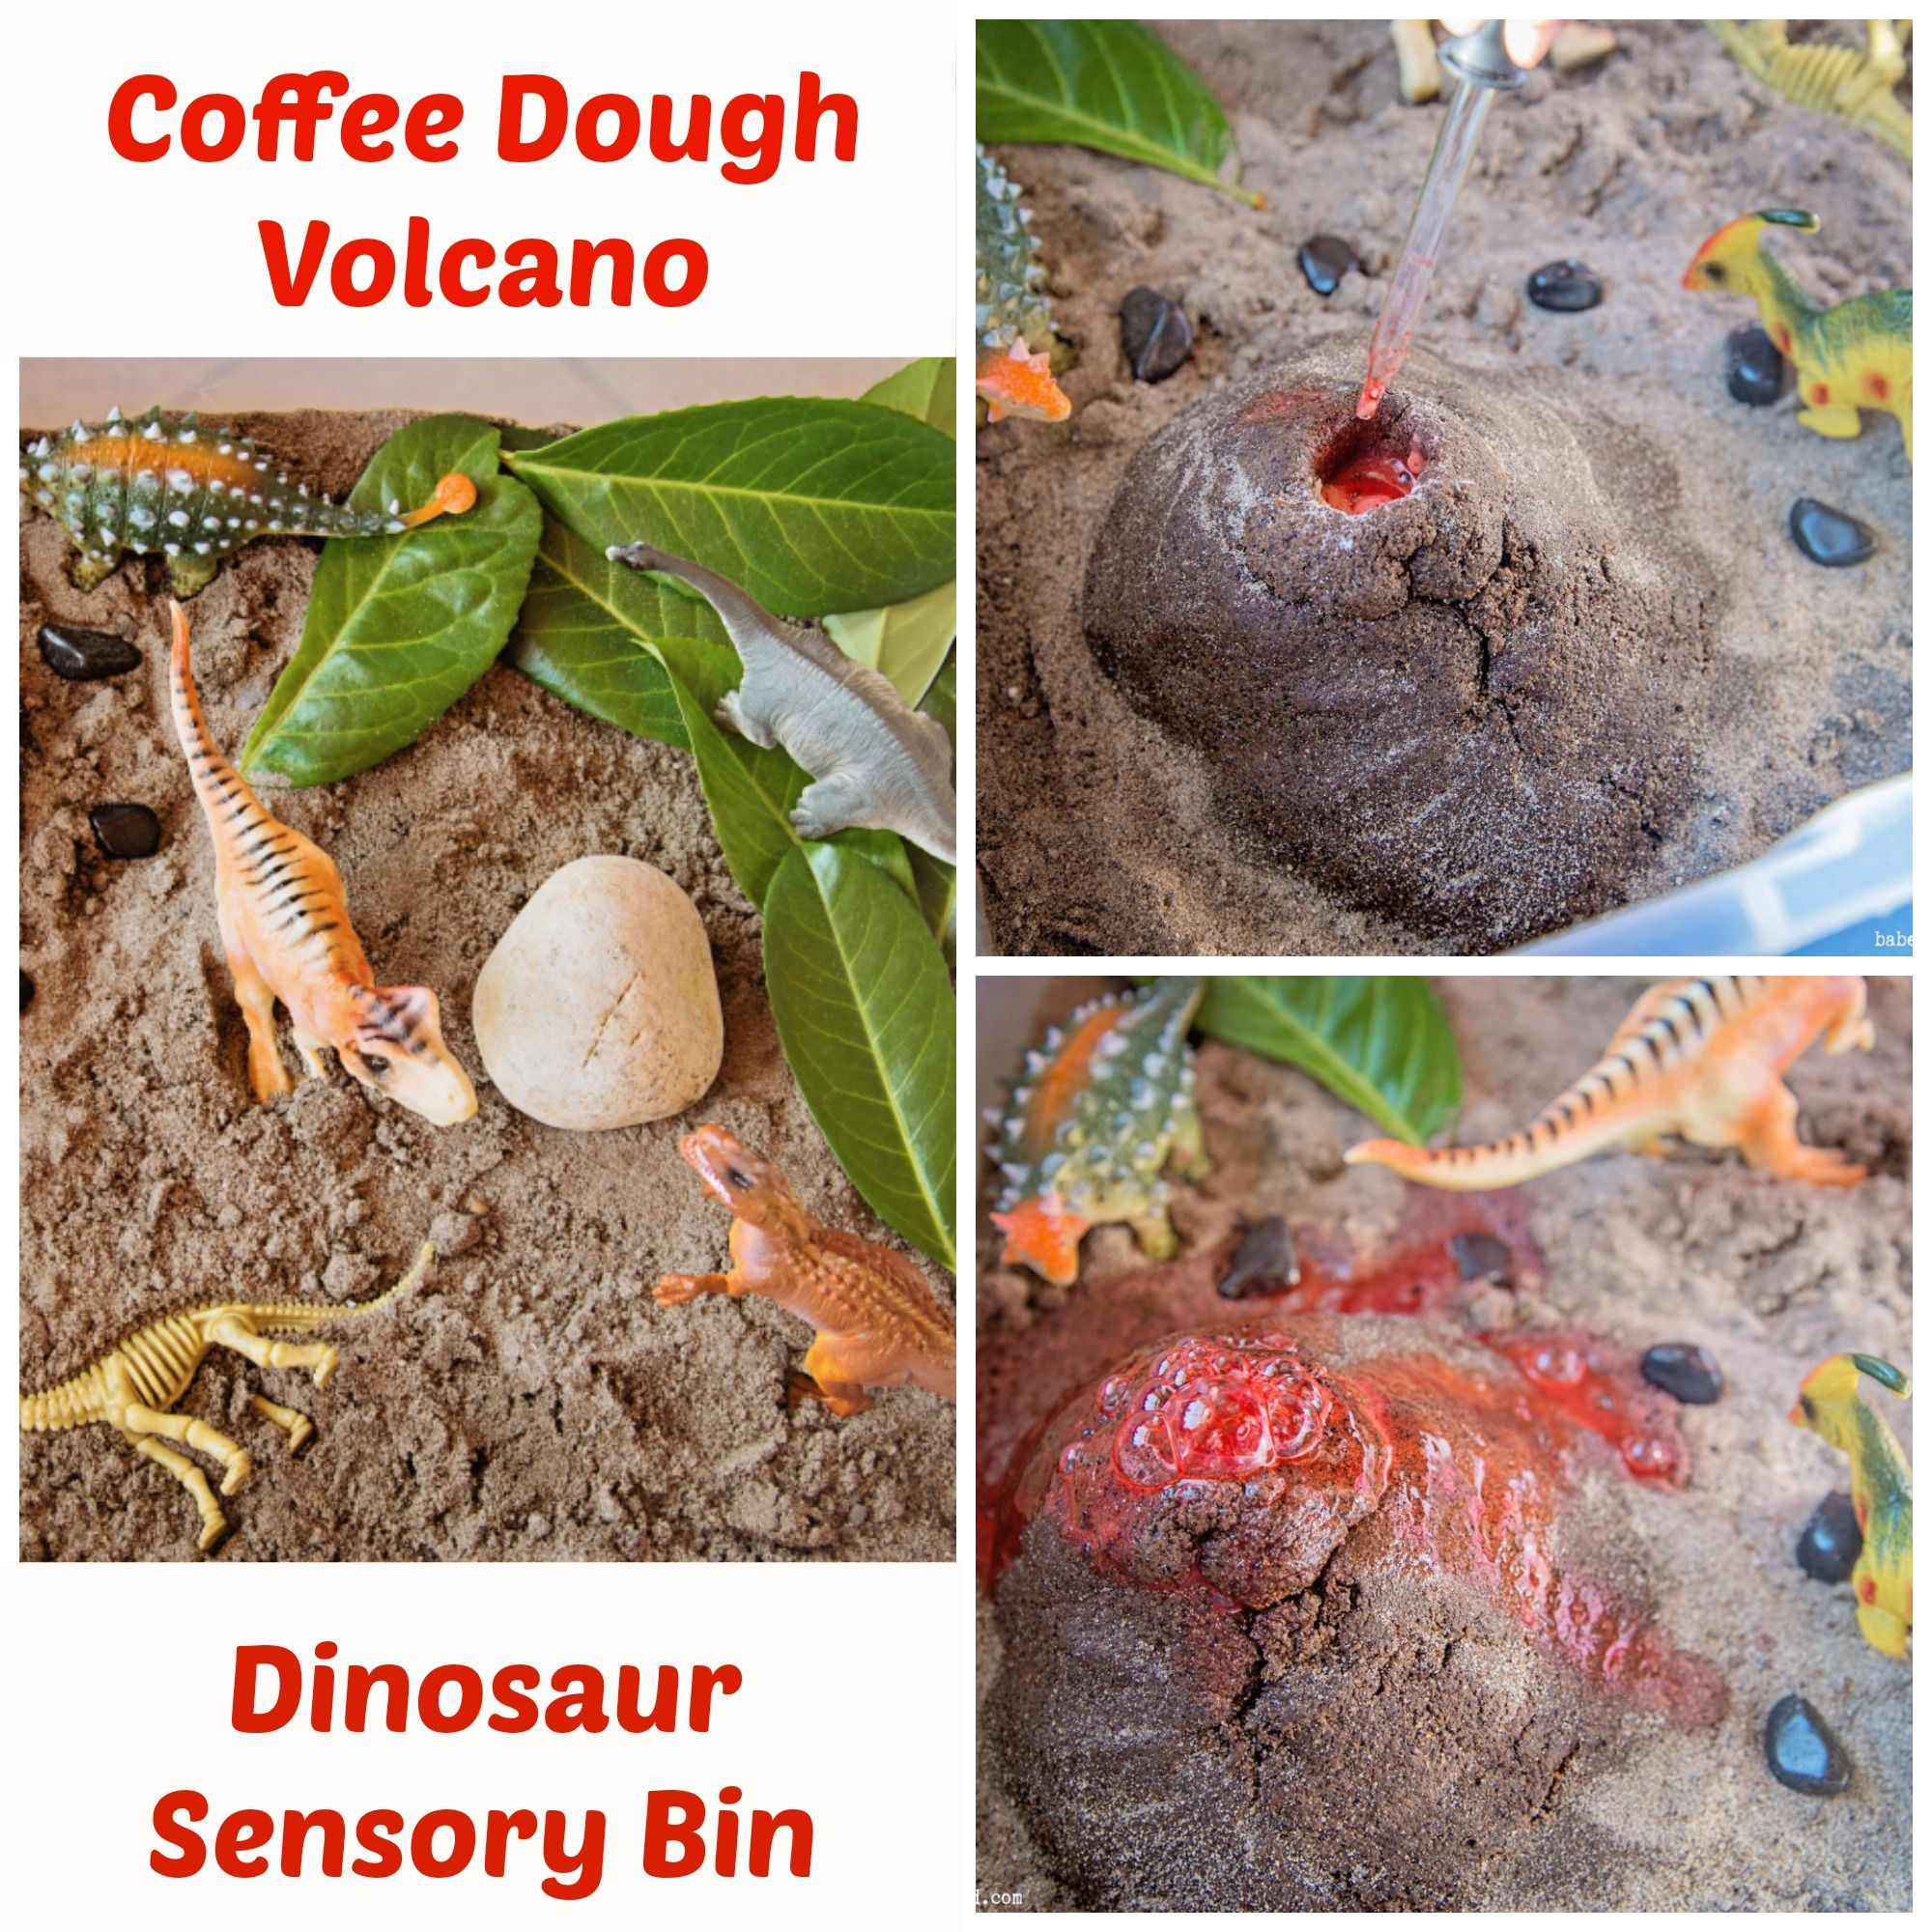 Coffee Dough Volcano Dinosaur Sensory Bin